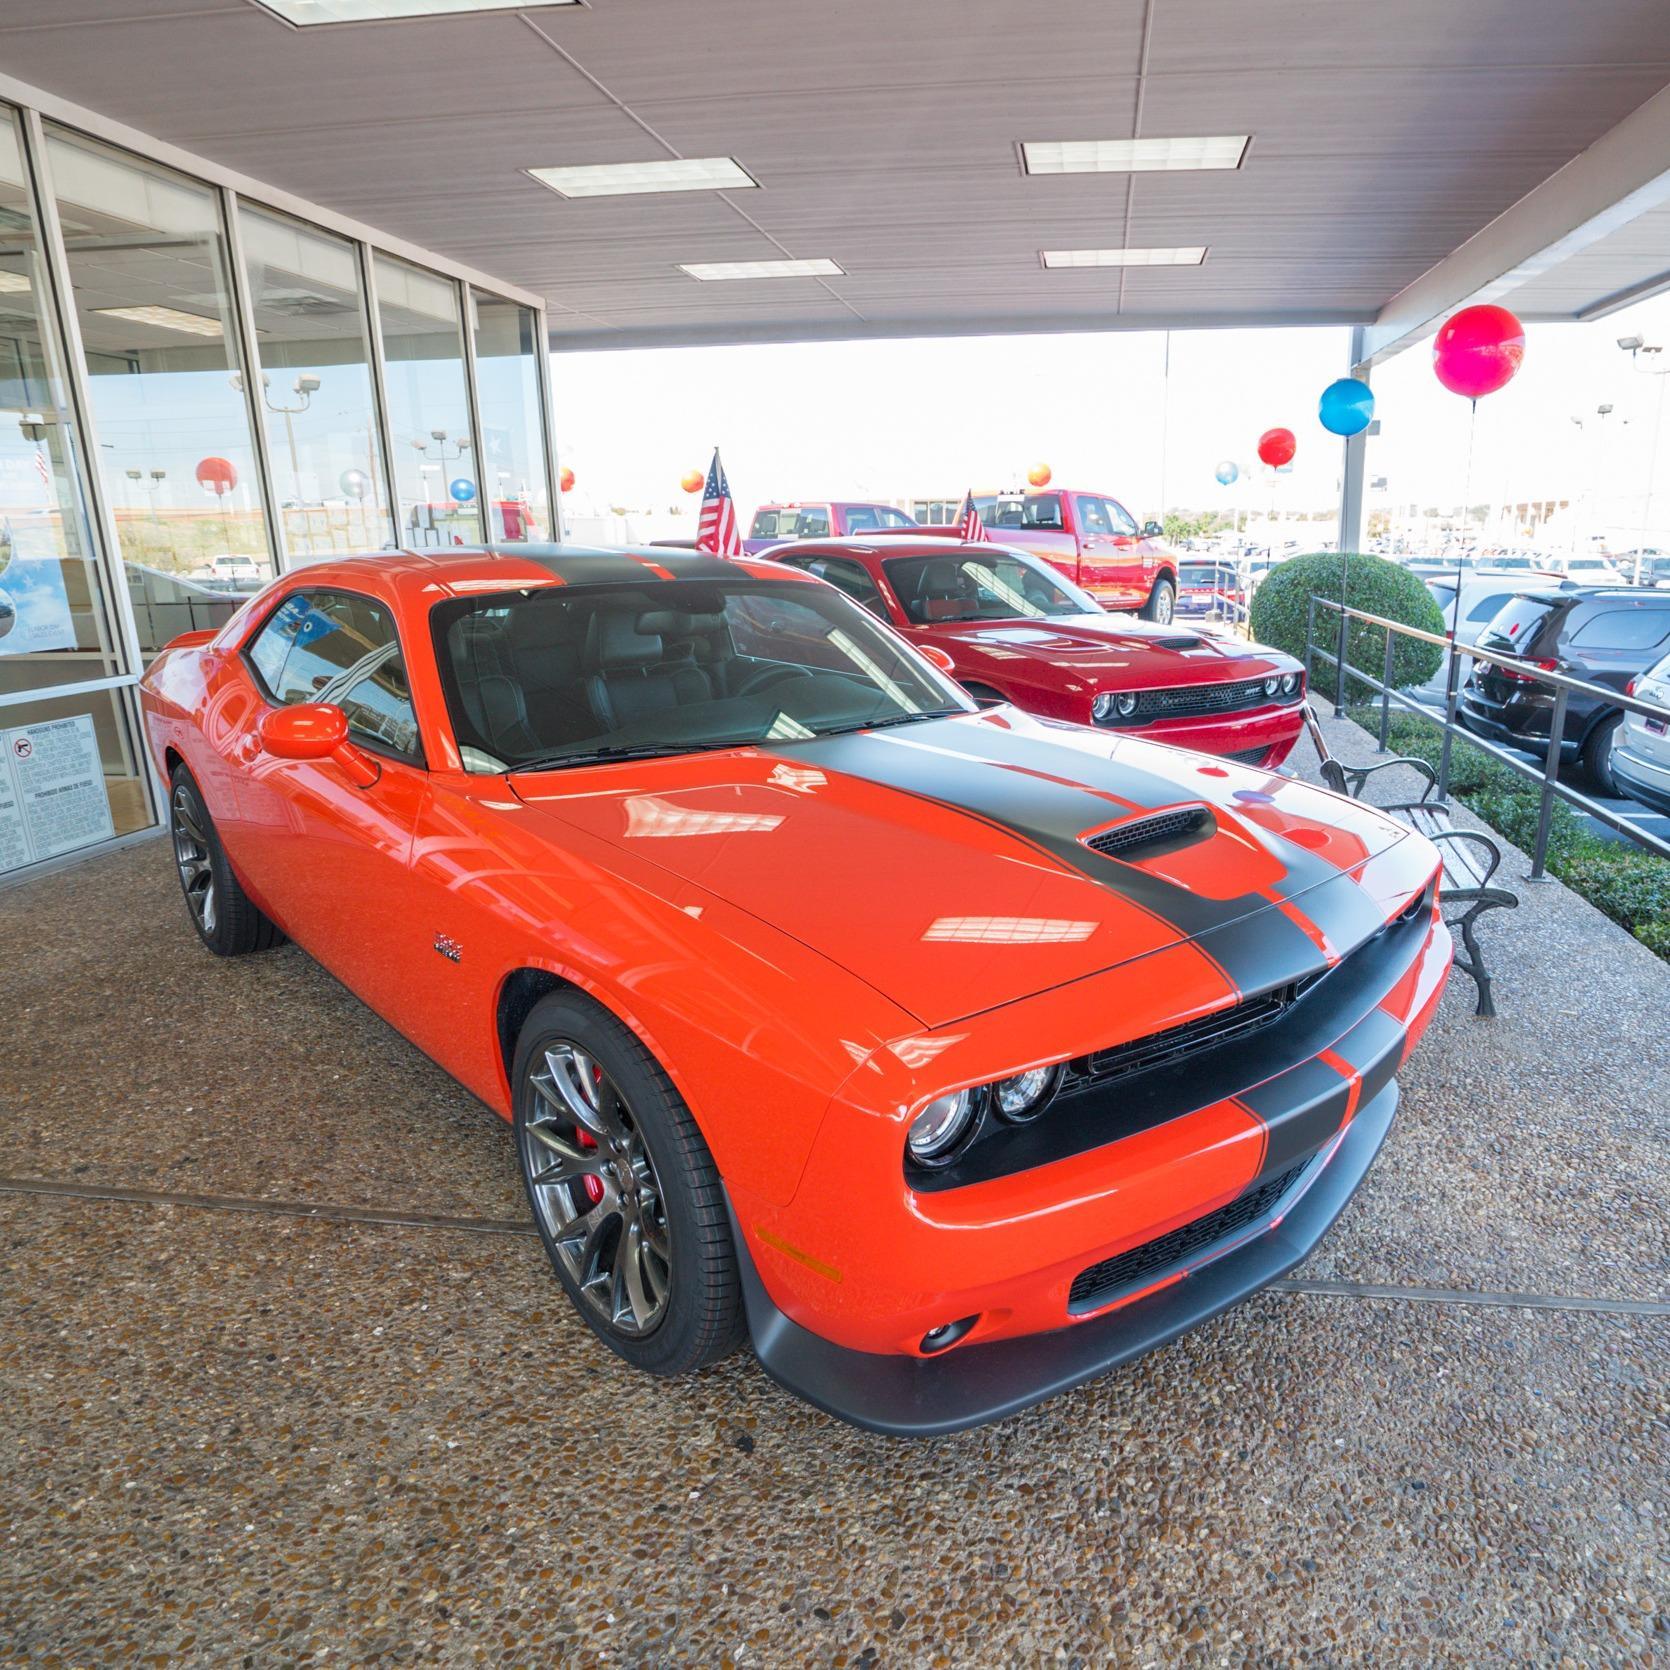 AutoNation Chrysler Dodge Jeep RAM North Richland Hills image 0